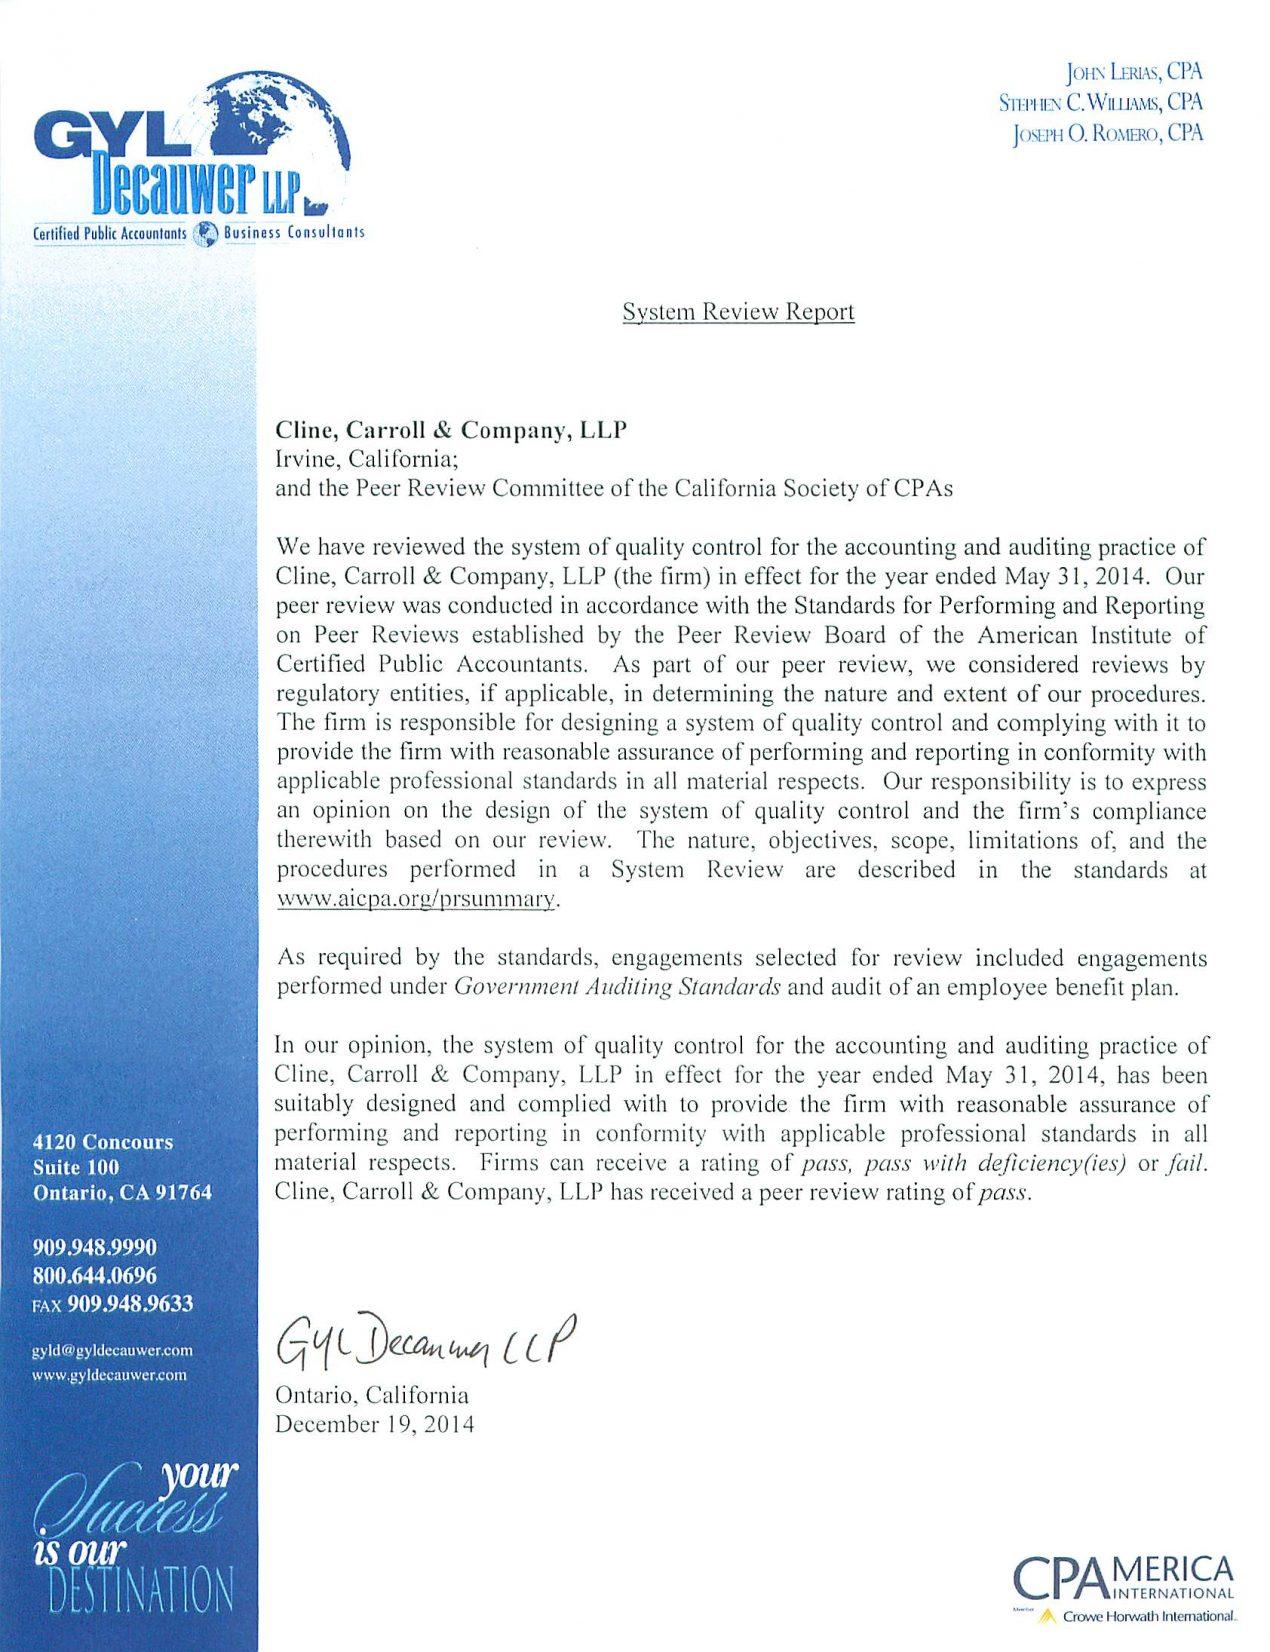 Steve greenberg irvine audit - Peer Review Report